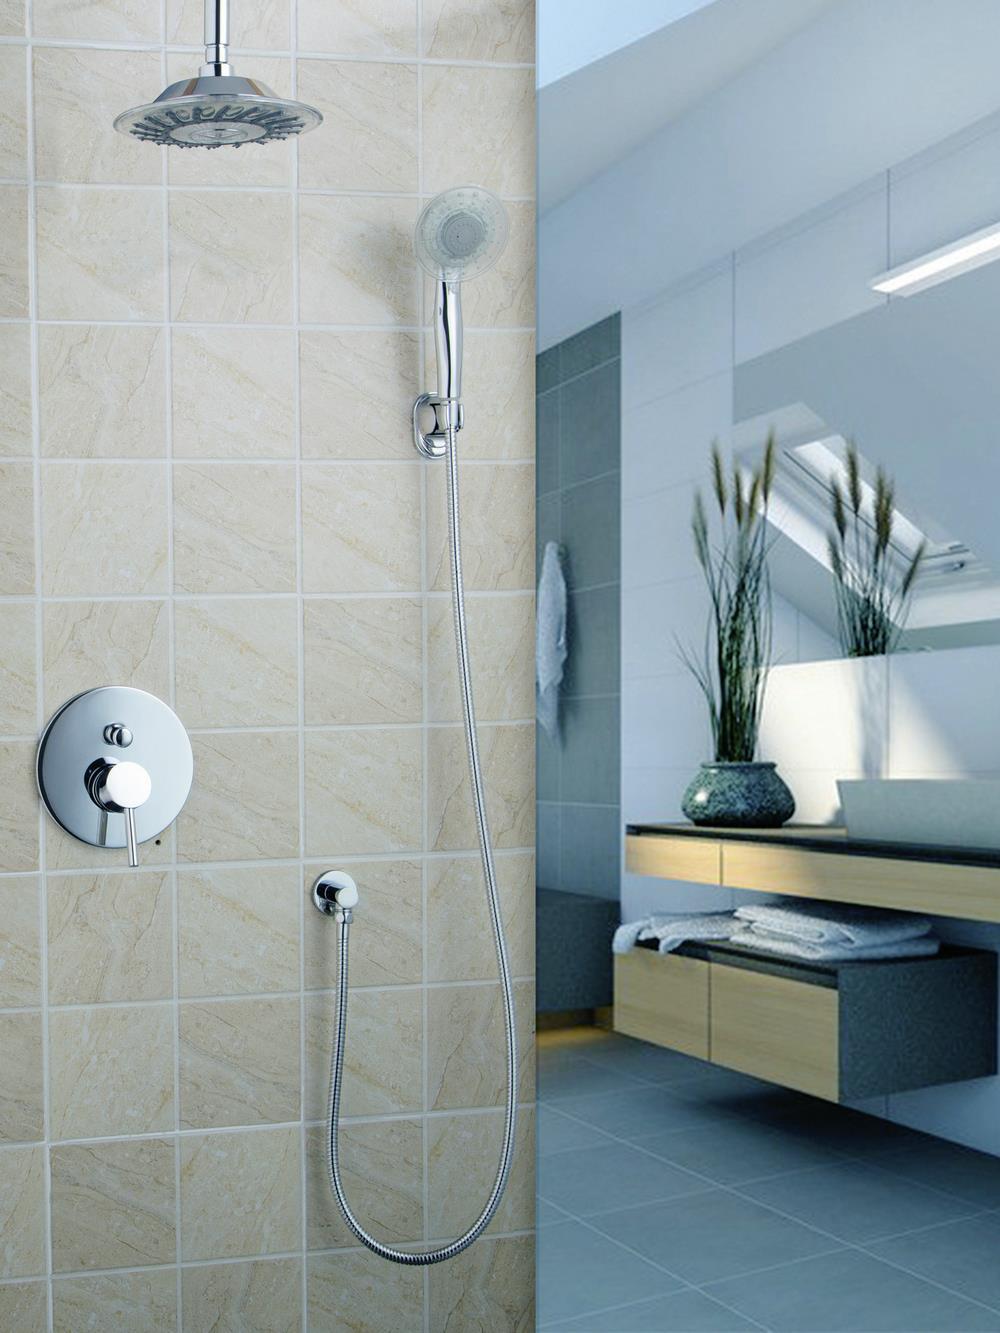 shower Set Wall Mount Monite Torneira 8 Shower Head 50243-22A Brass Chrome Bathroom Hot Cold Bathtub Faucet Handheld